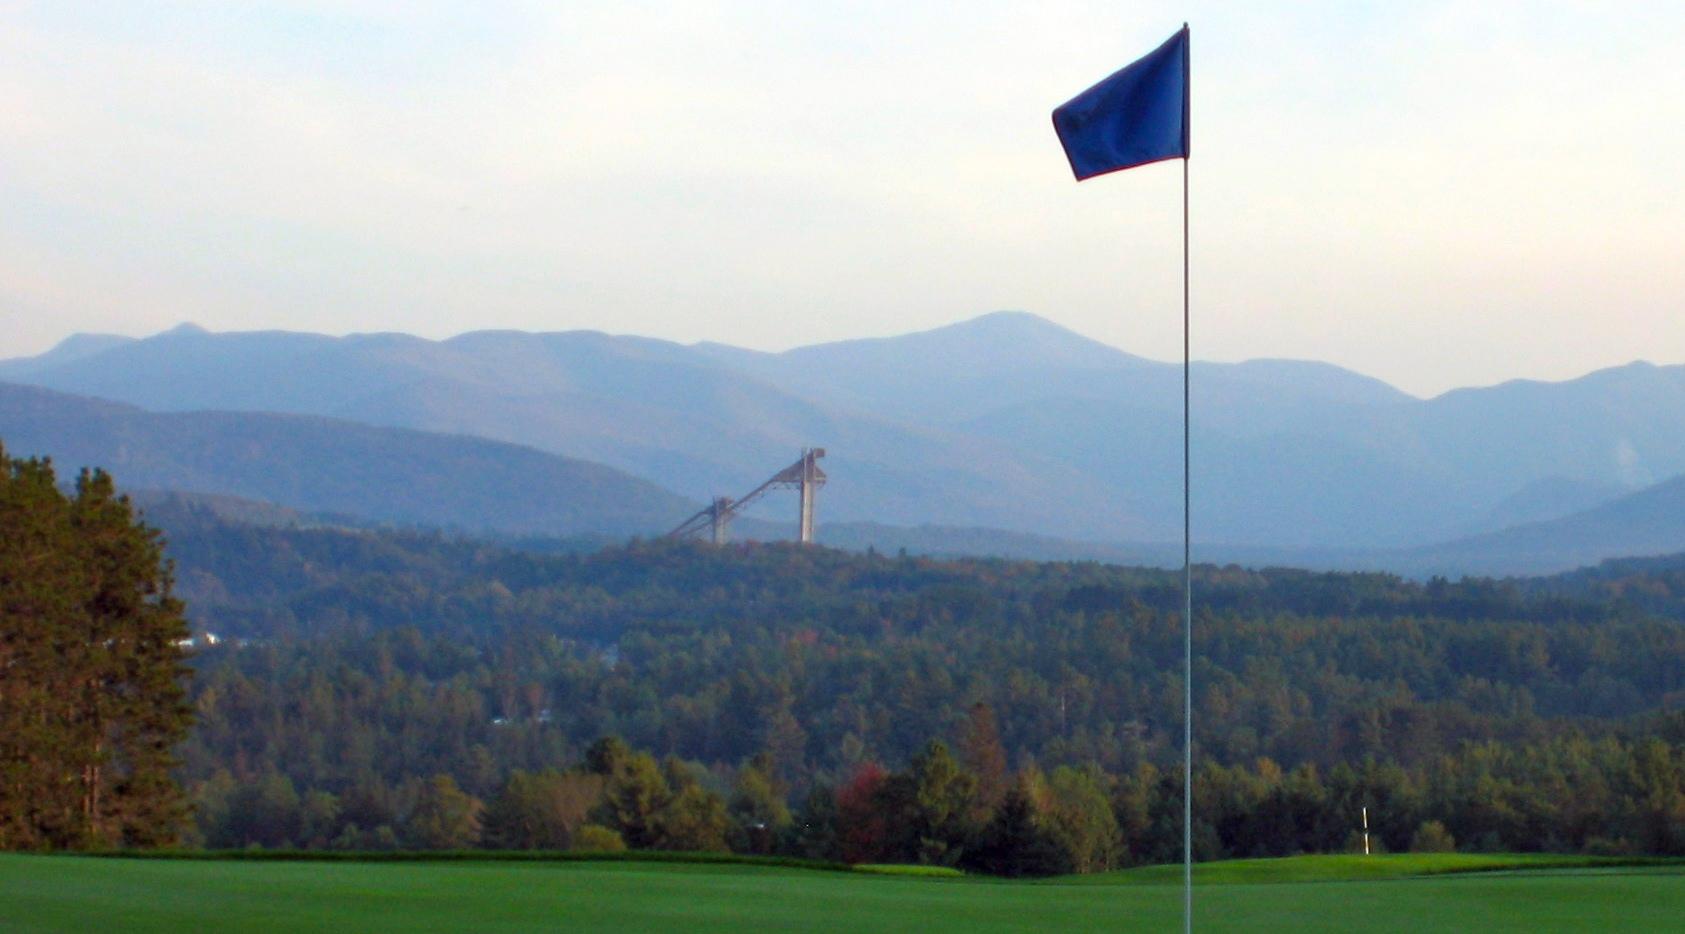 Golf course towards Olympic ski Jumps